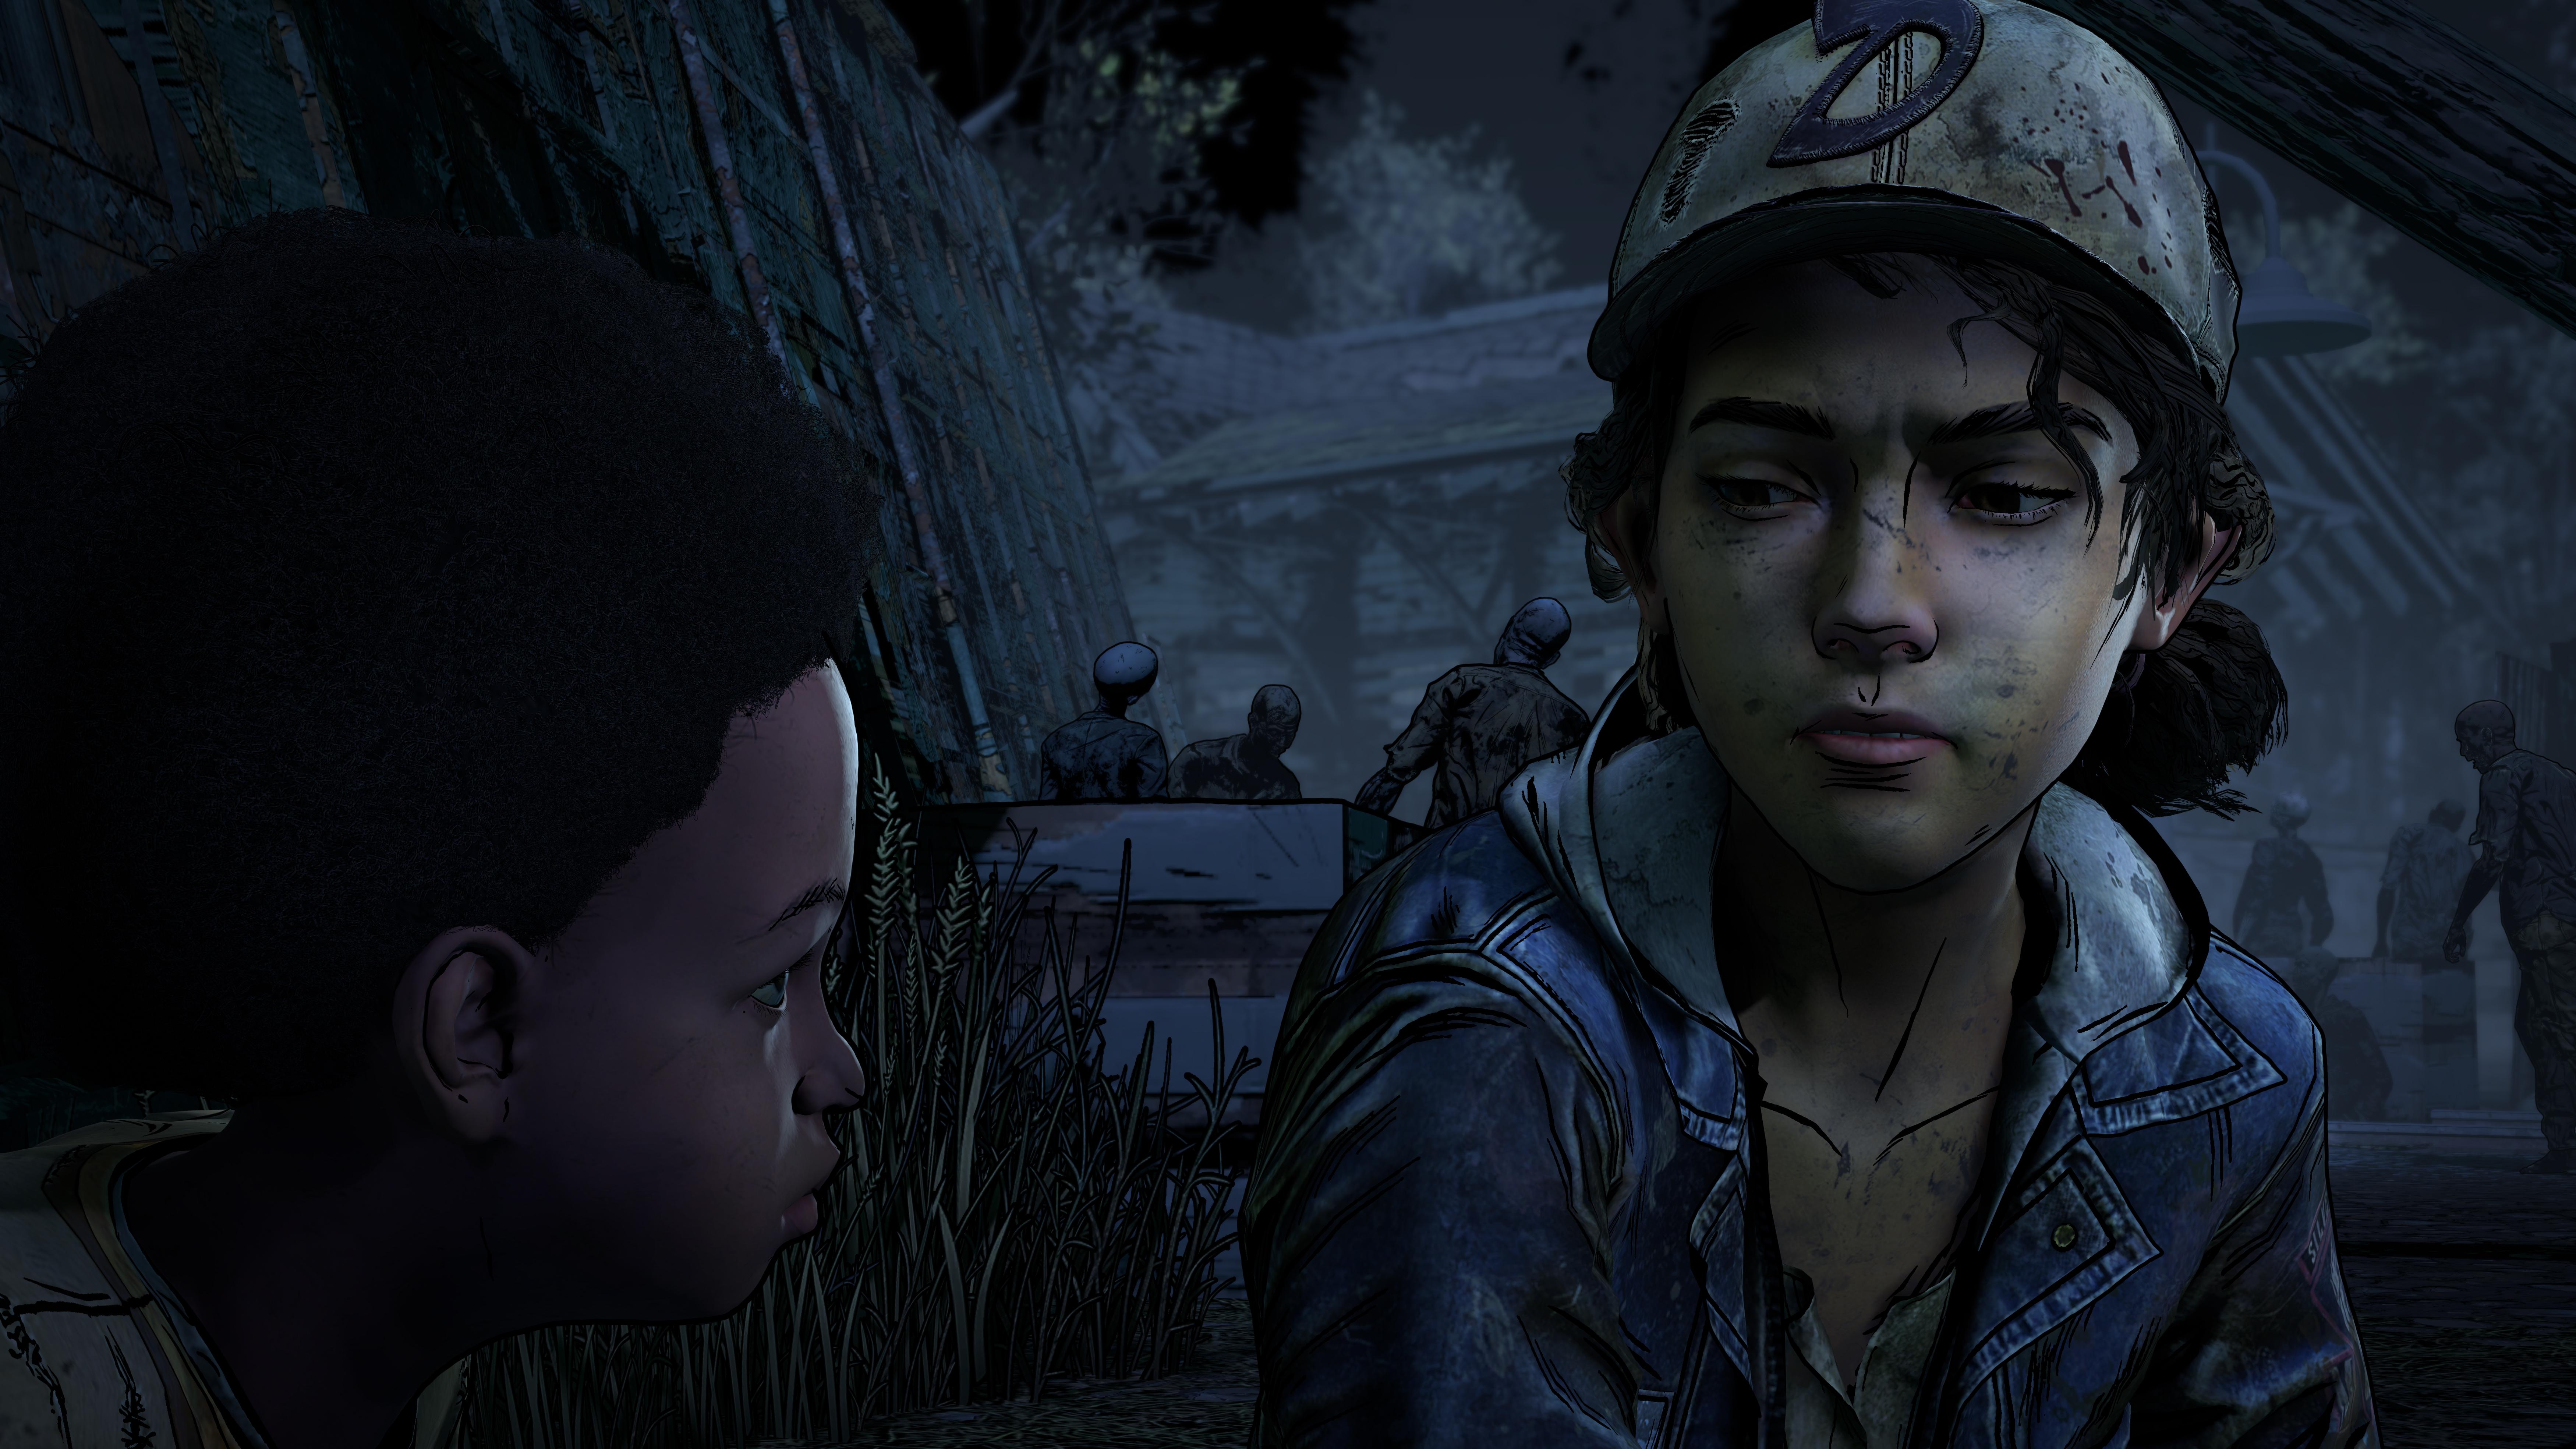 The Walking Dead: The Final Season - Clem and AJ